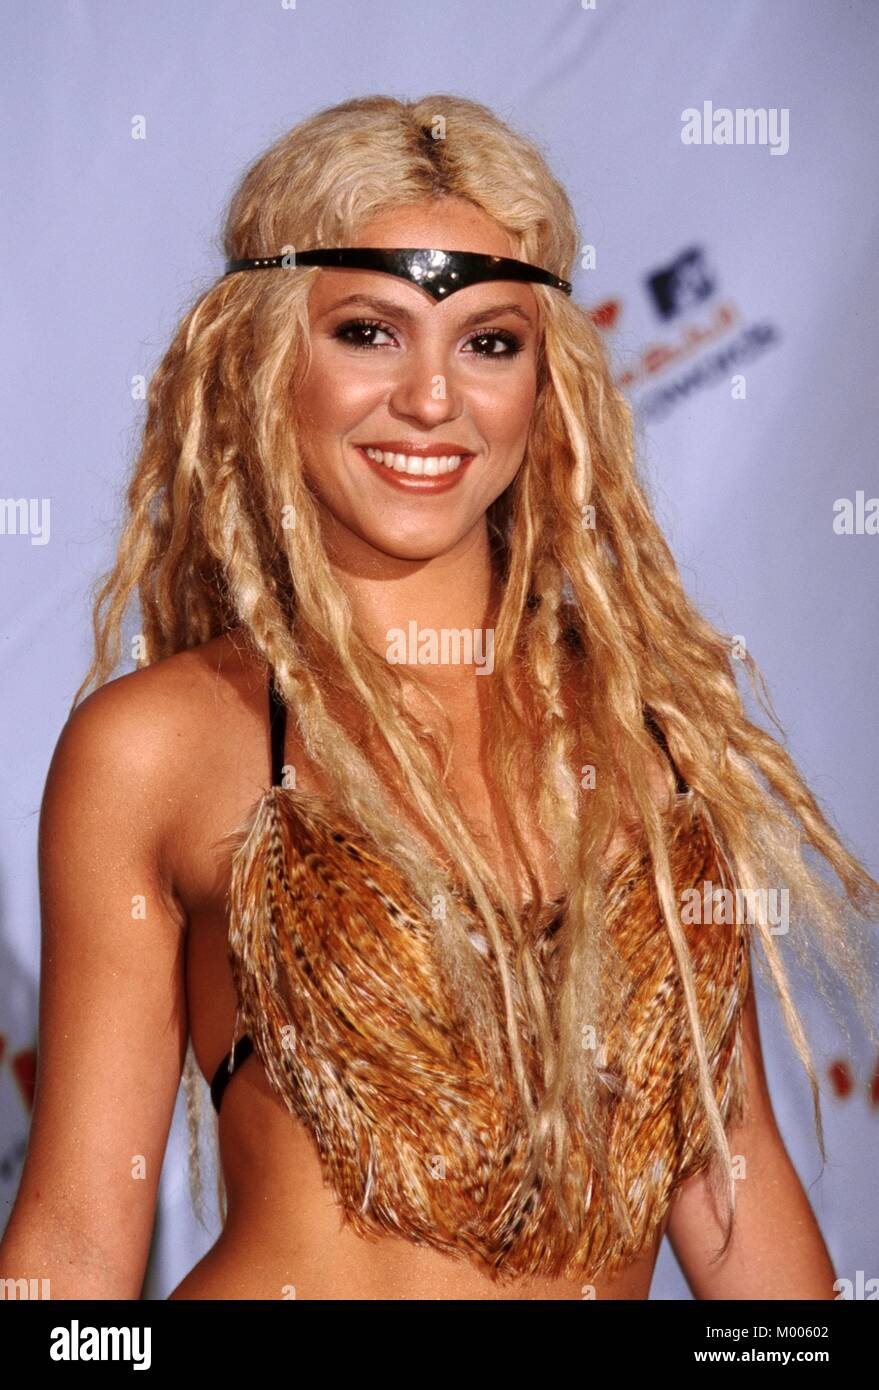 Shakira MTV 2001 Video Music Awards Metropolitan Opera House, Lincoln Center,  NYC 9/6/01 ©RTSpellman / MediaPunch Stock Photo